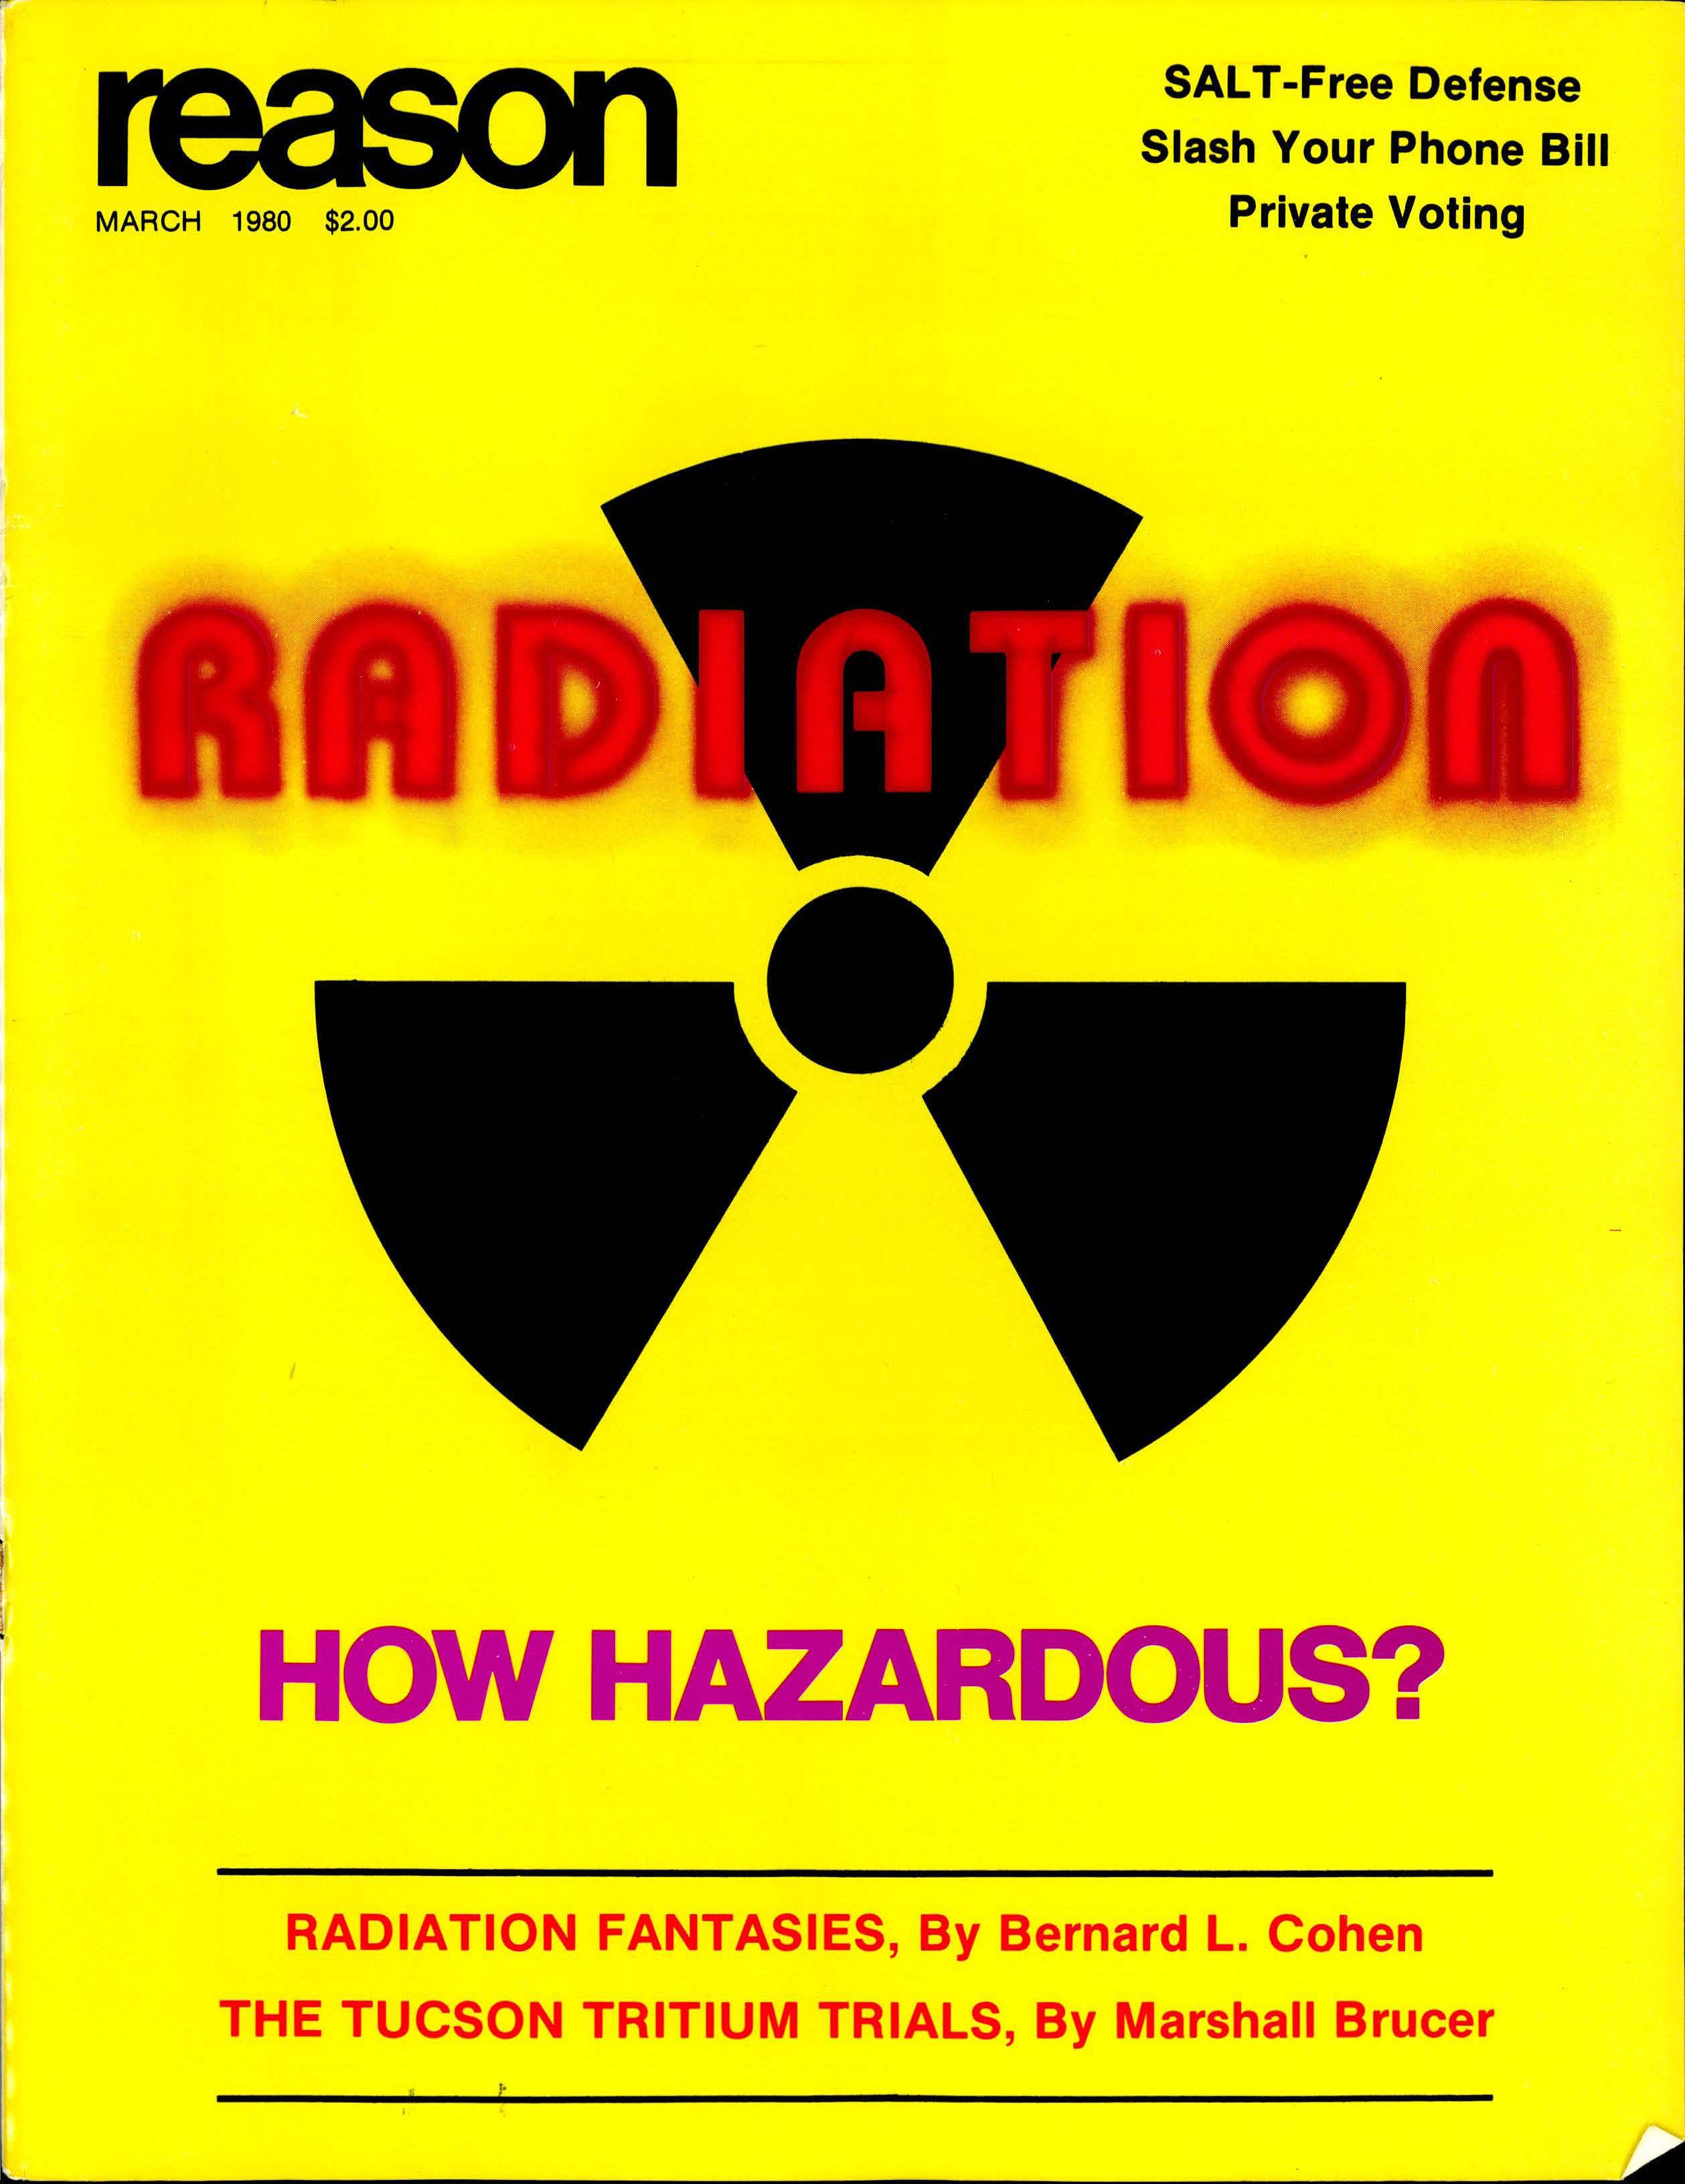 Reason Magazine, March 1980 cover image